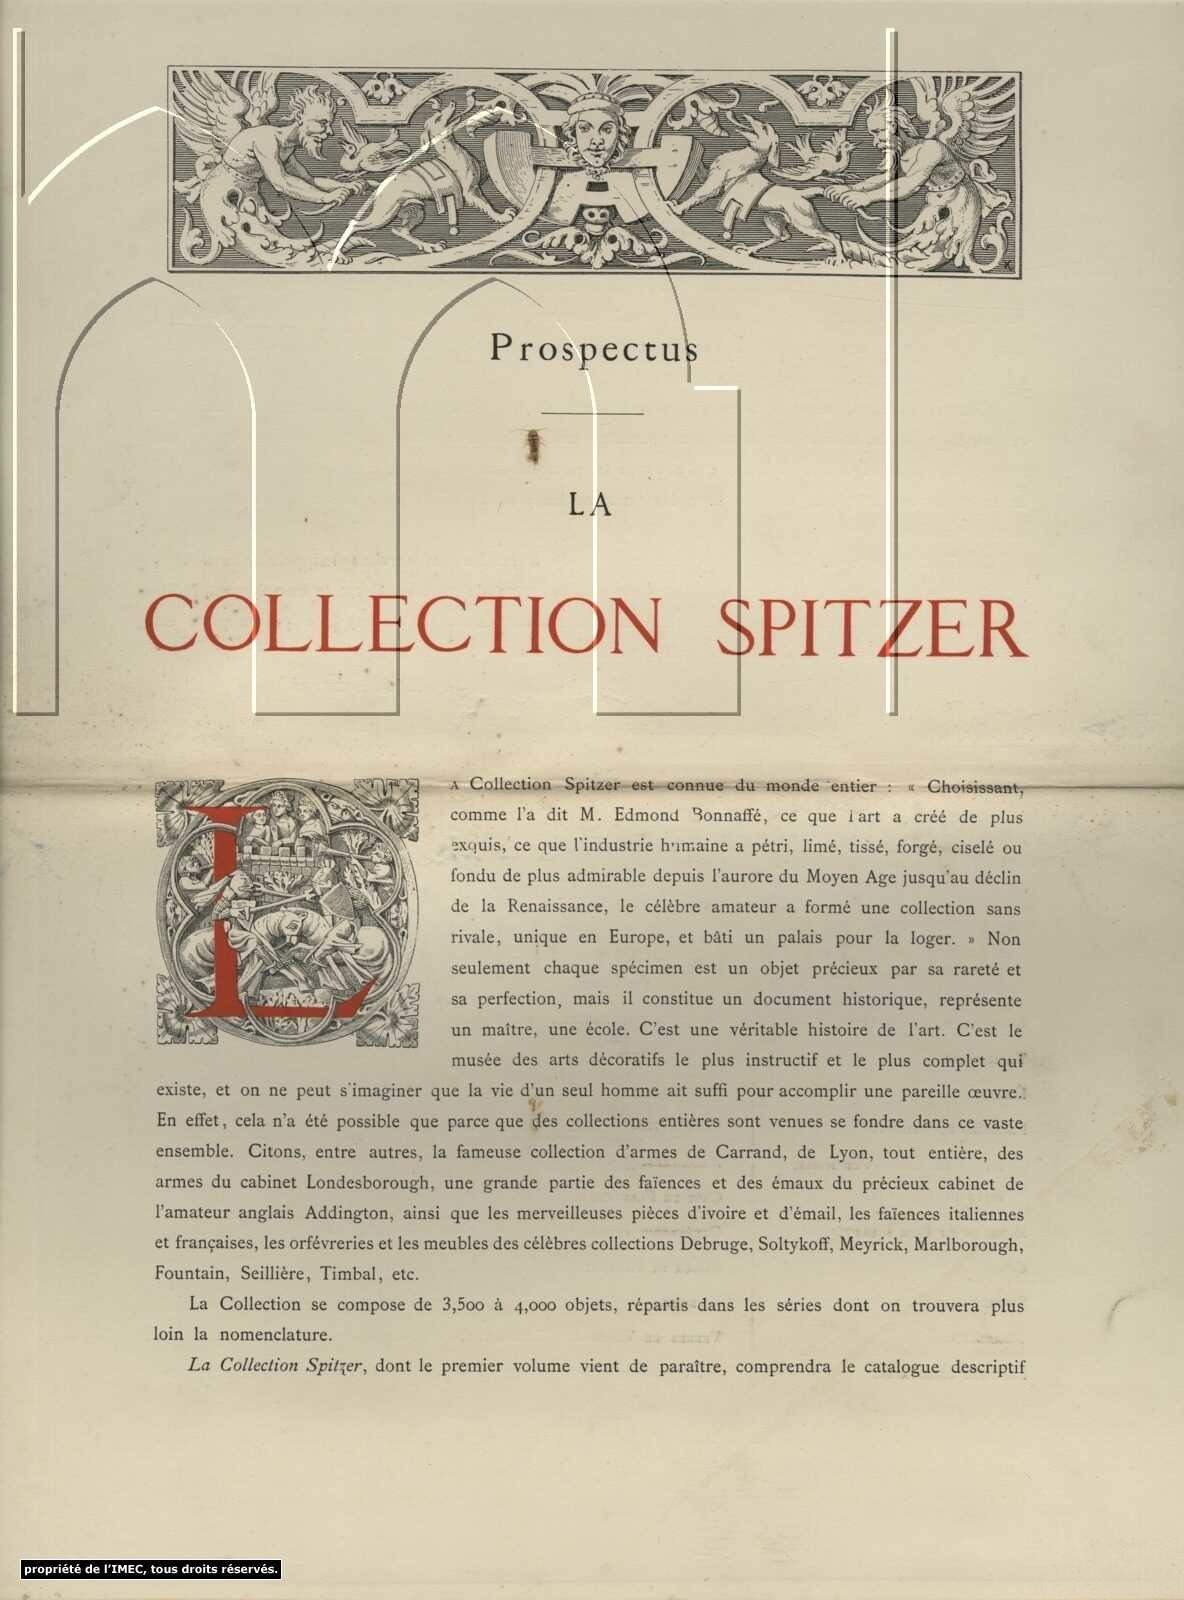 image for Librairie Quantin